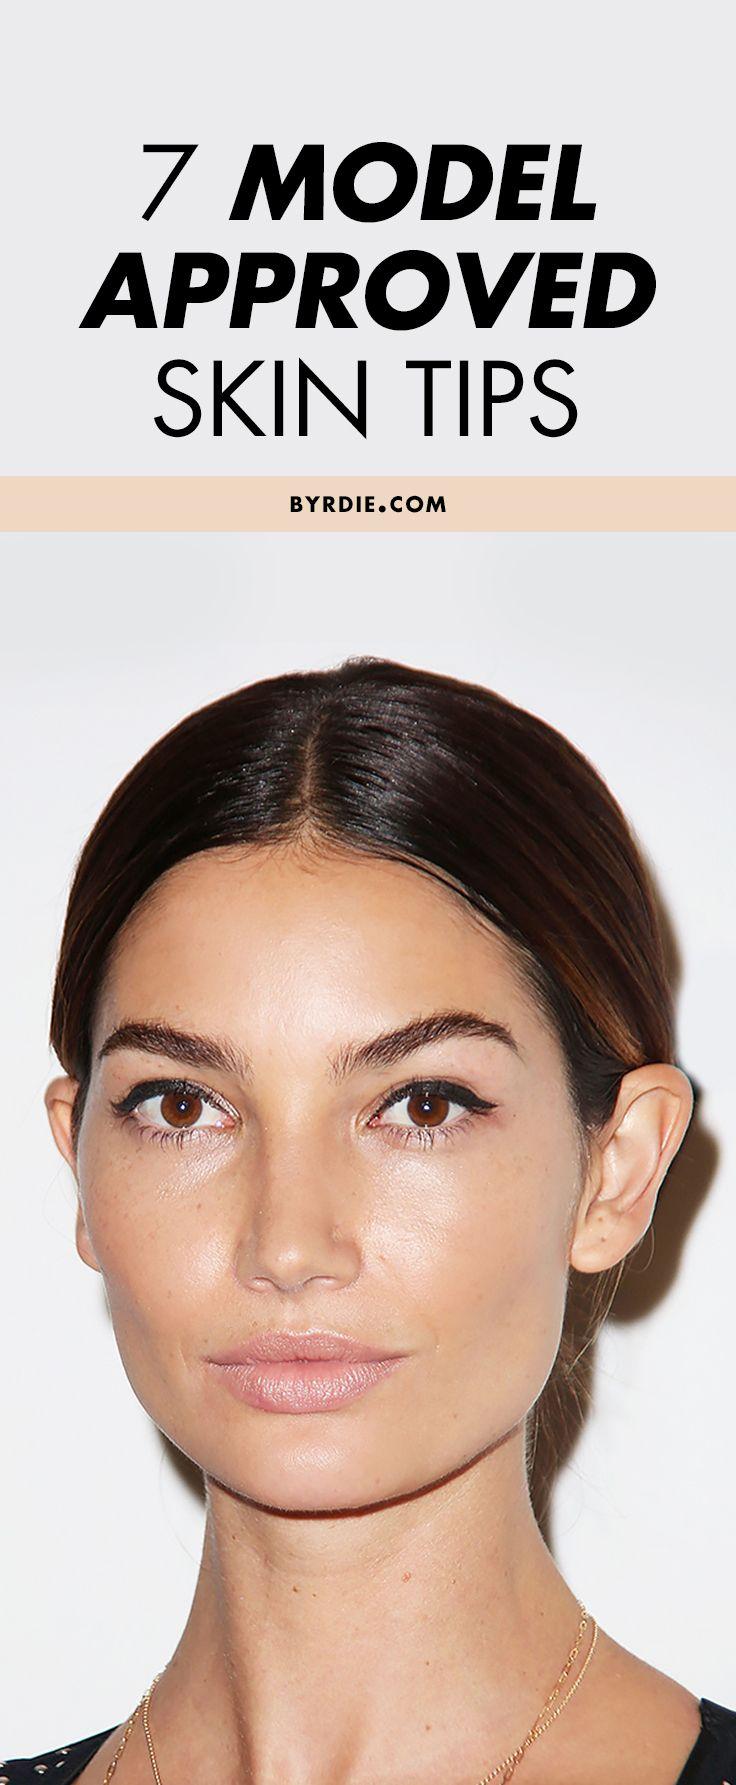 The Broke Girl S Guide To Taking Care Of Your Skin Like A Model Skin Tips Beauty Skin Skin